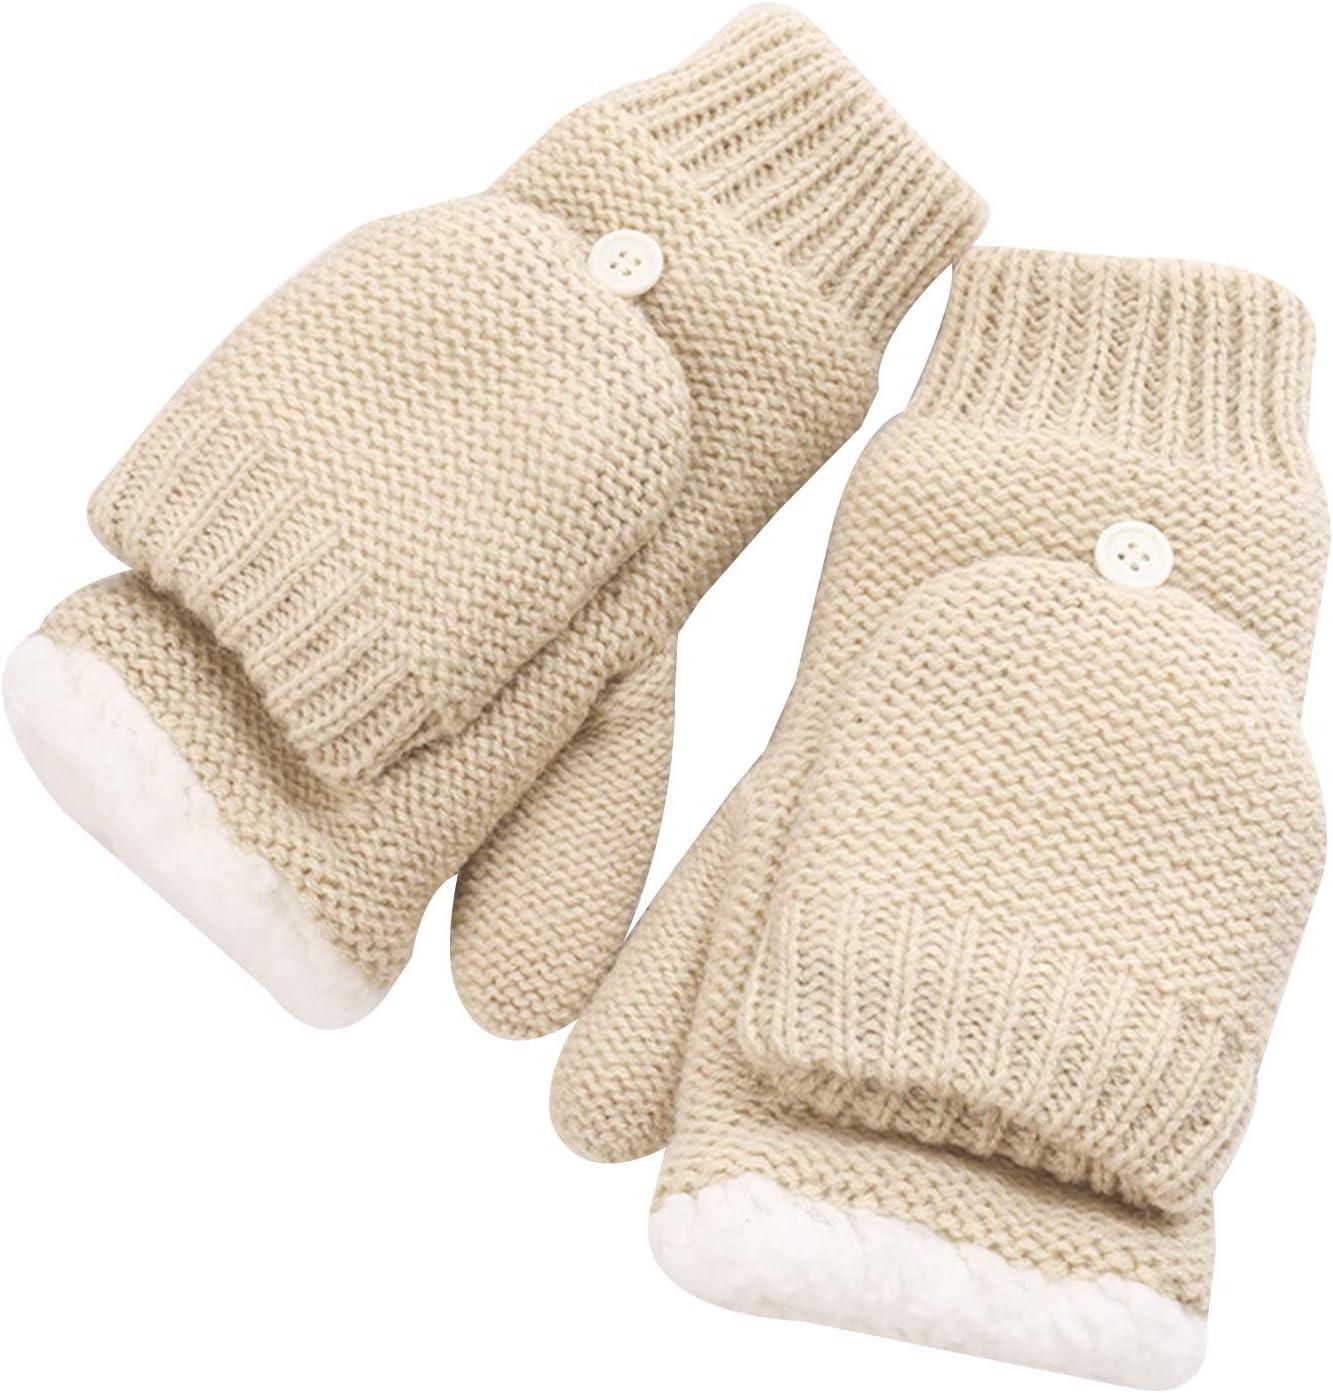 FOLDING Gloves Ladies Winter Comfortable Fleece Lining Convertible Fingerless Knit Gloves Gloves (Color : Khaki)